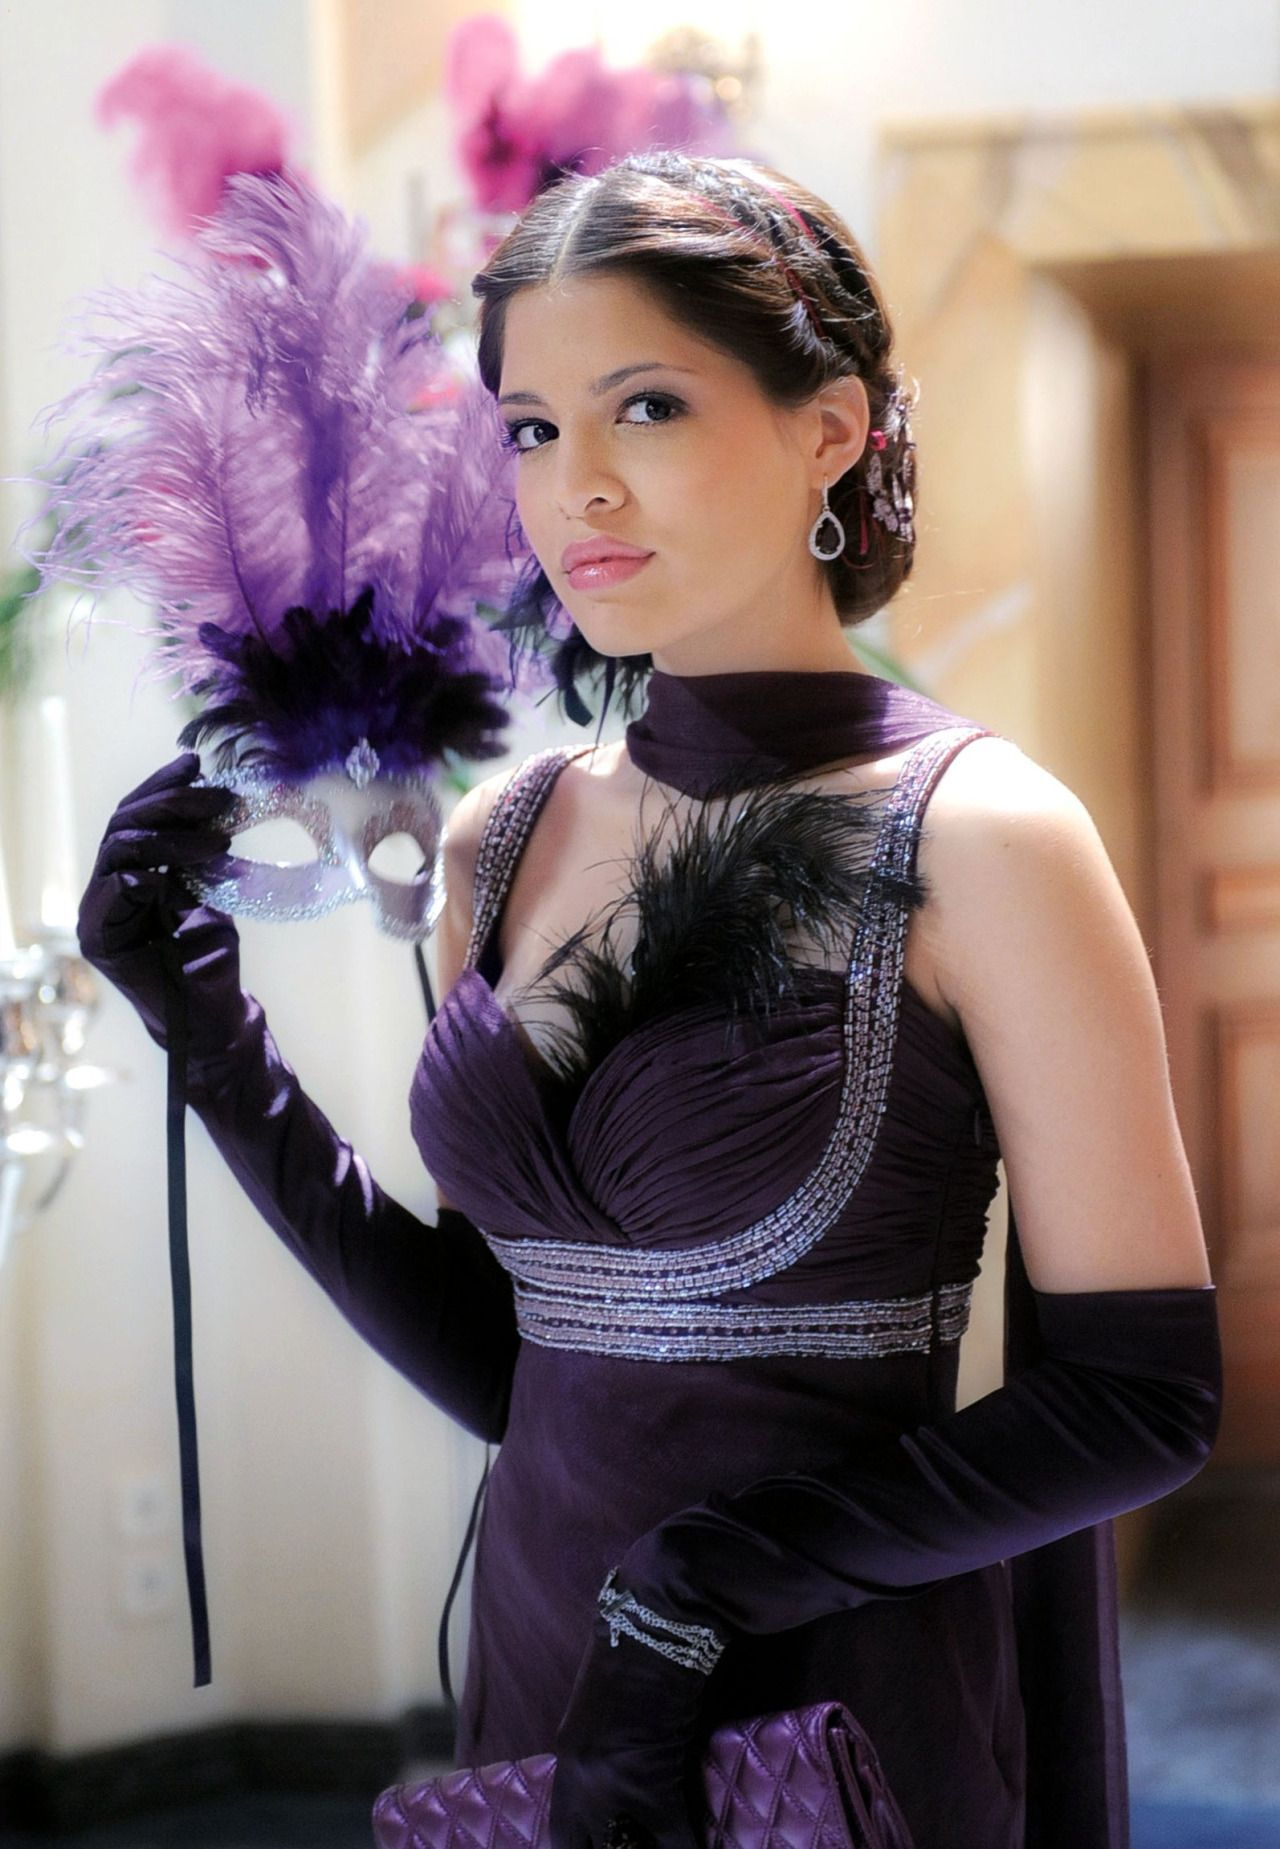 Womens leather gloves purple - German Actress Jasmin Lord Wearing Opera Gloves